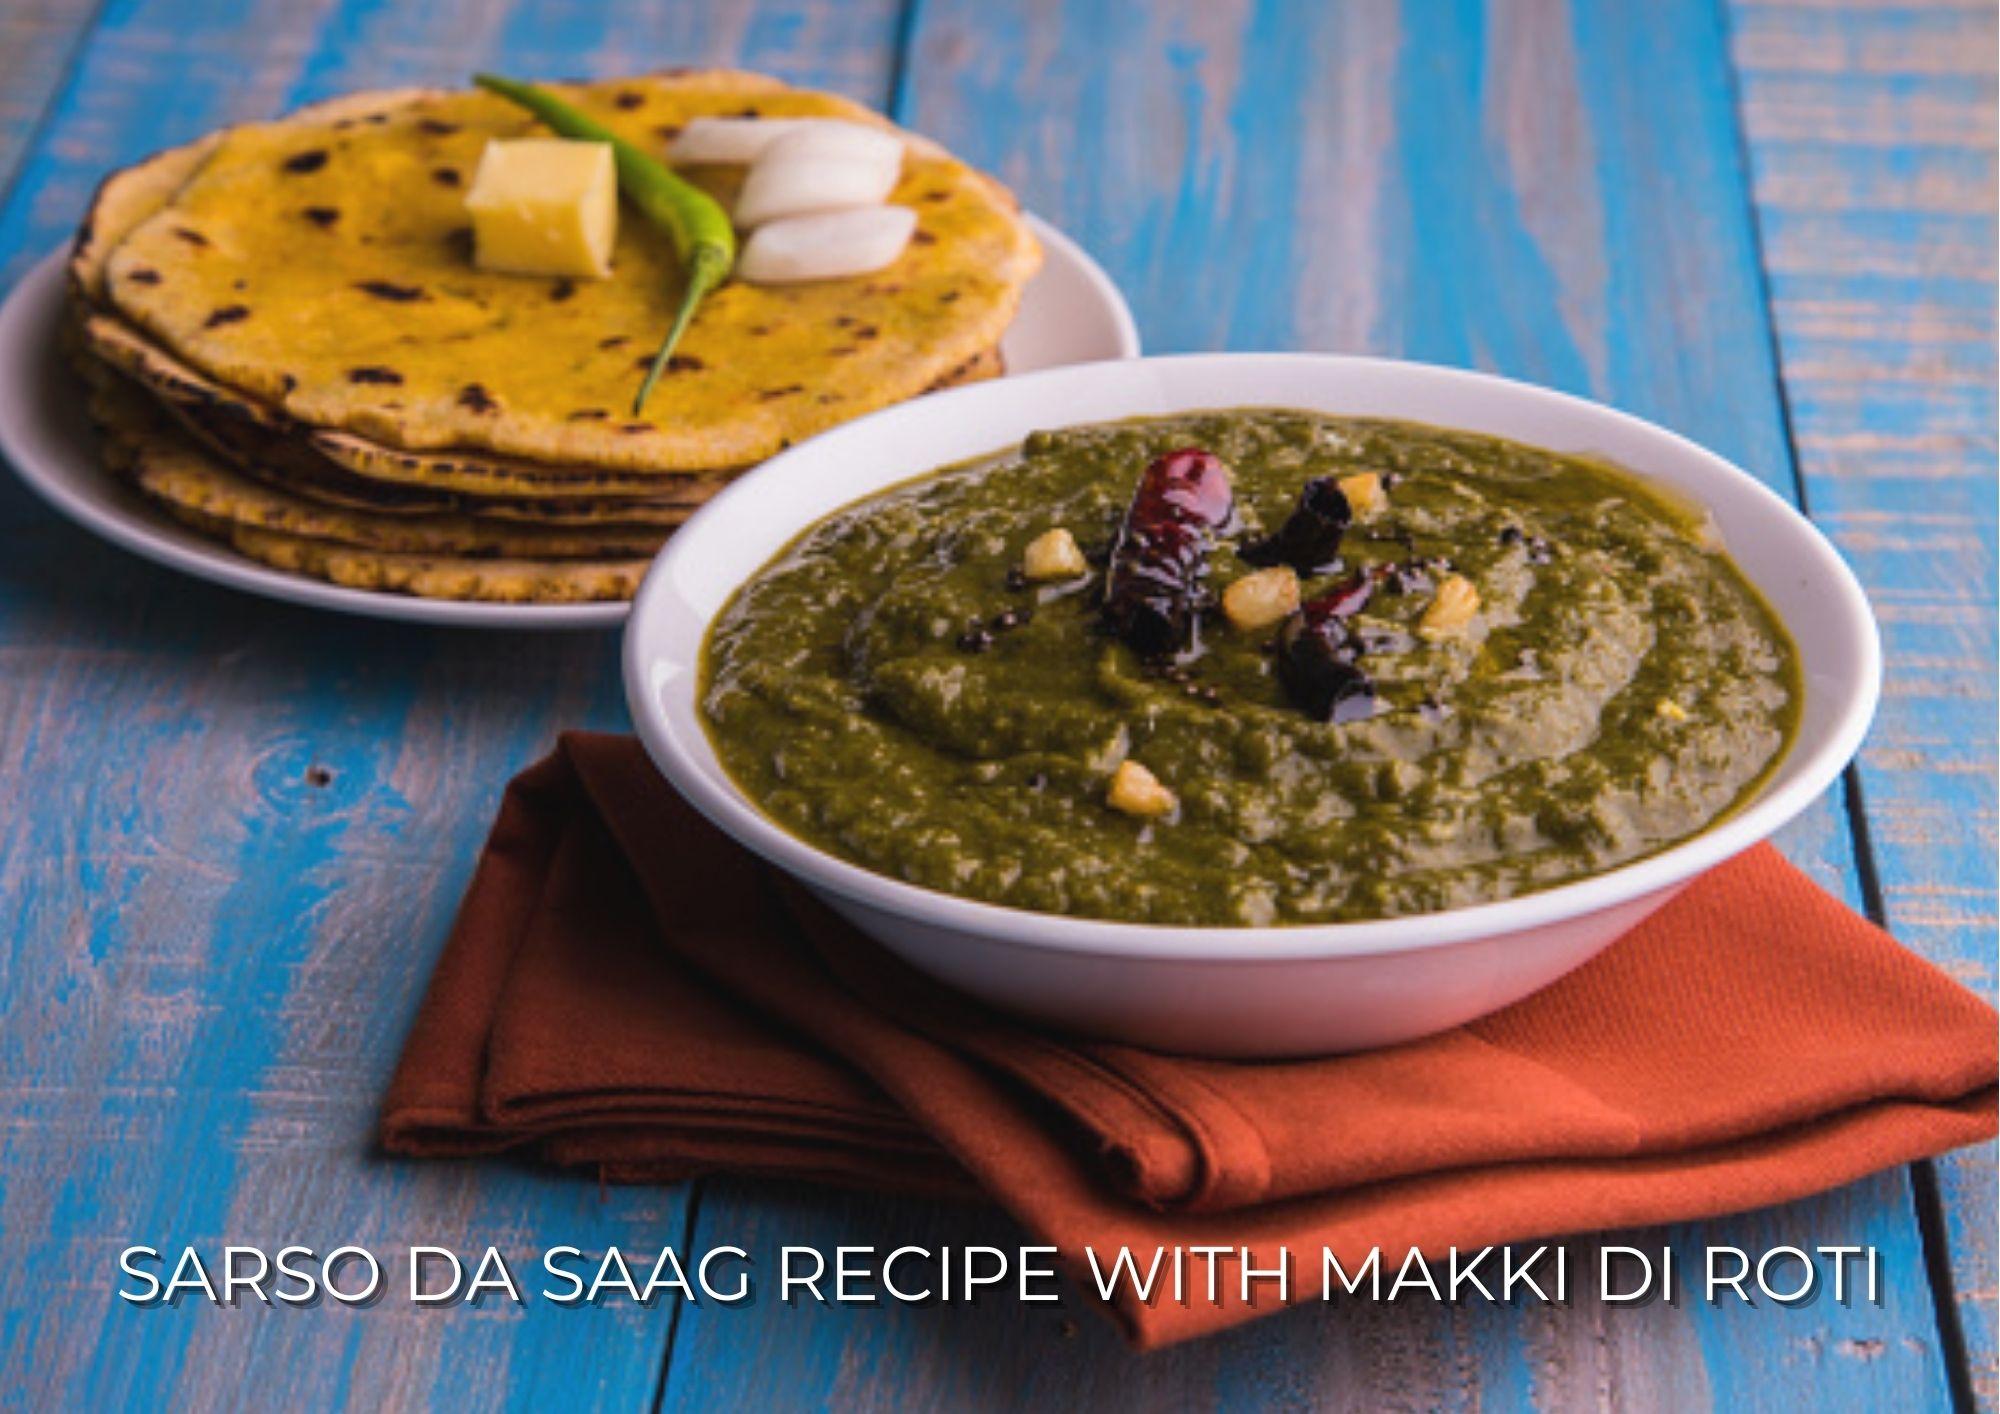 Sarso Da Saag Recipe With Makki Di Roti